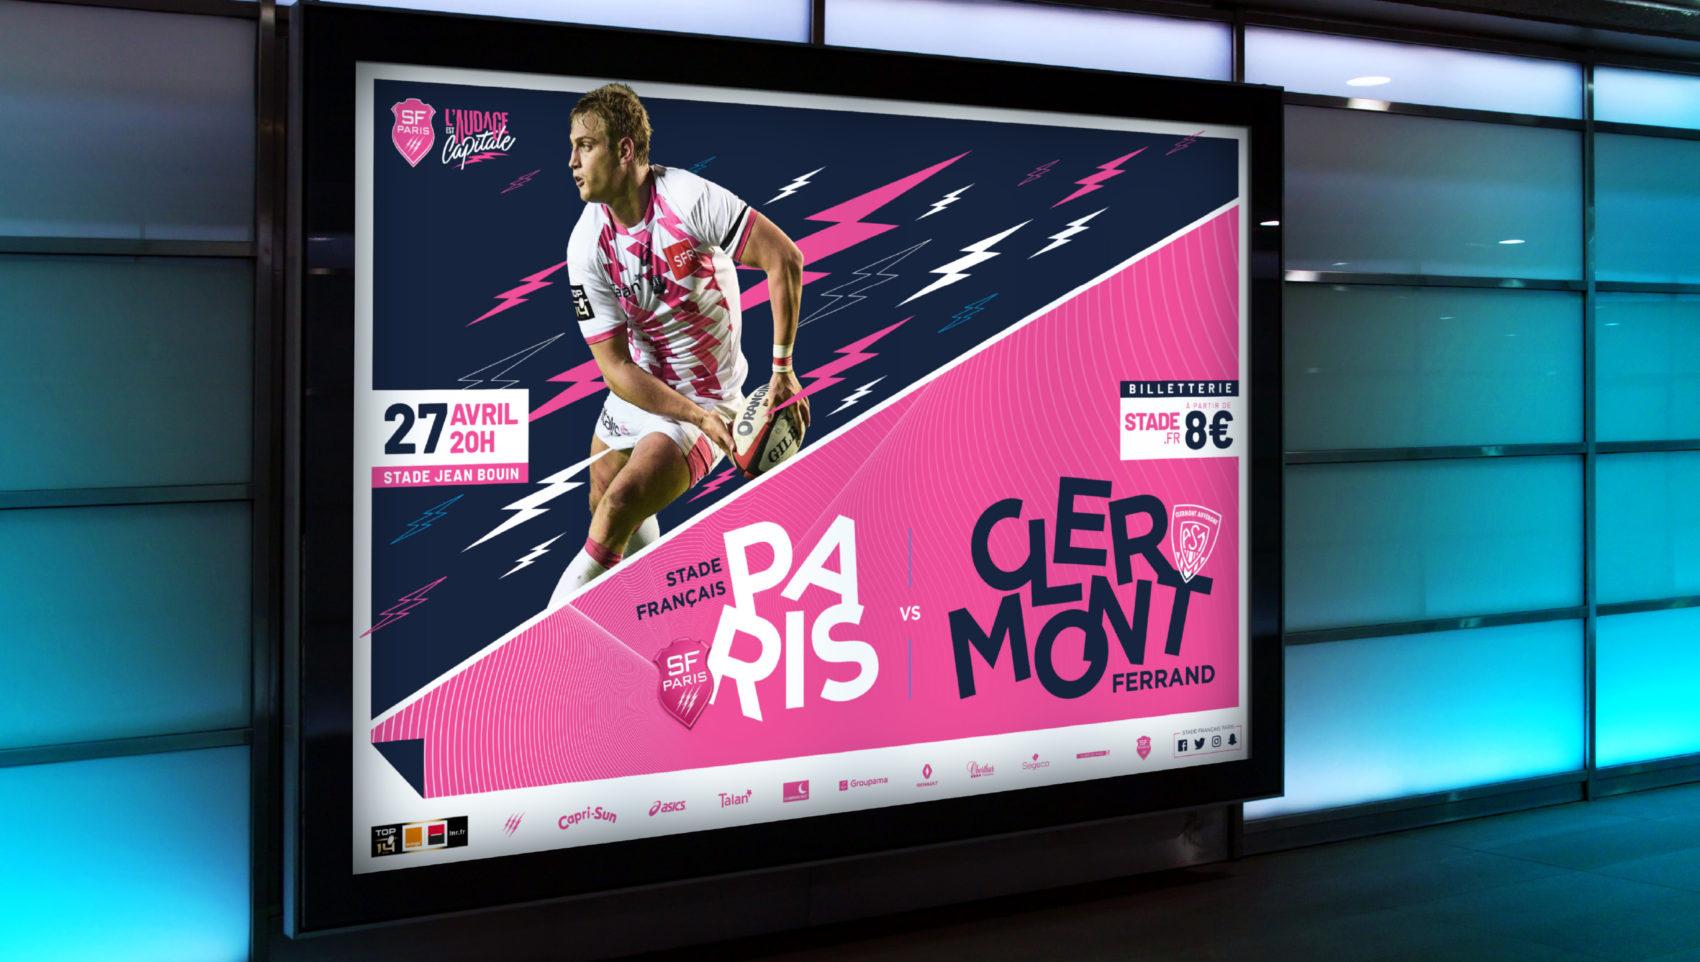 06_SFP_2018_stade_francais_paris_stade_jean_bouin_2018_l_audace_est_capitale